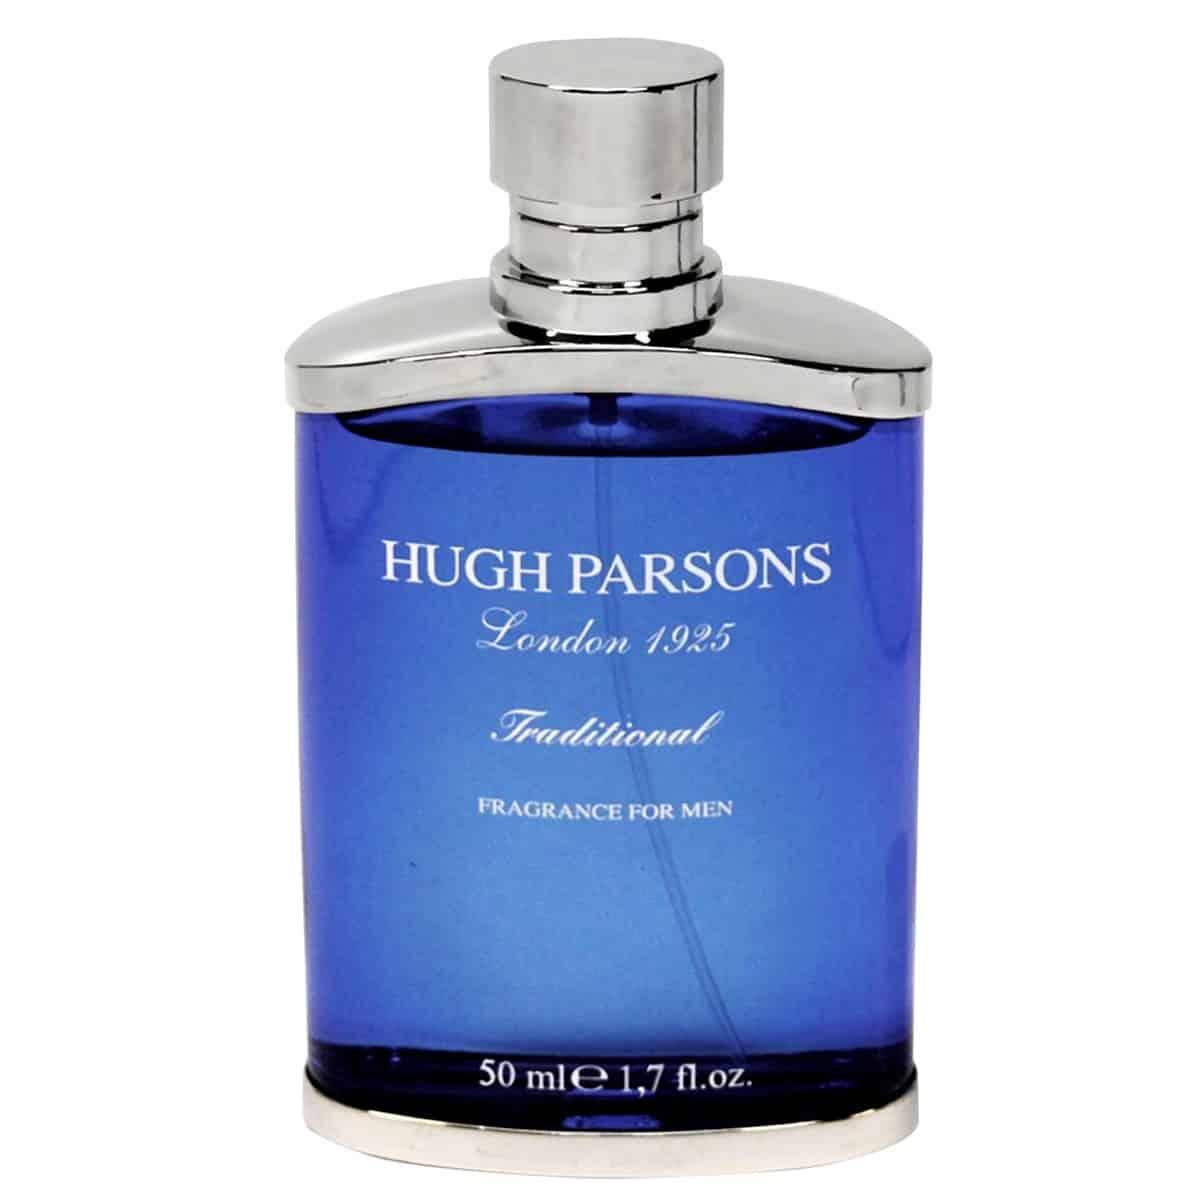 Hugh Parsons Traditional